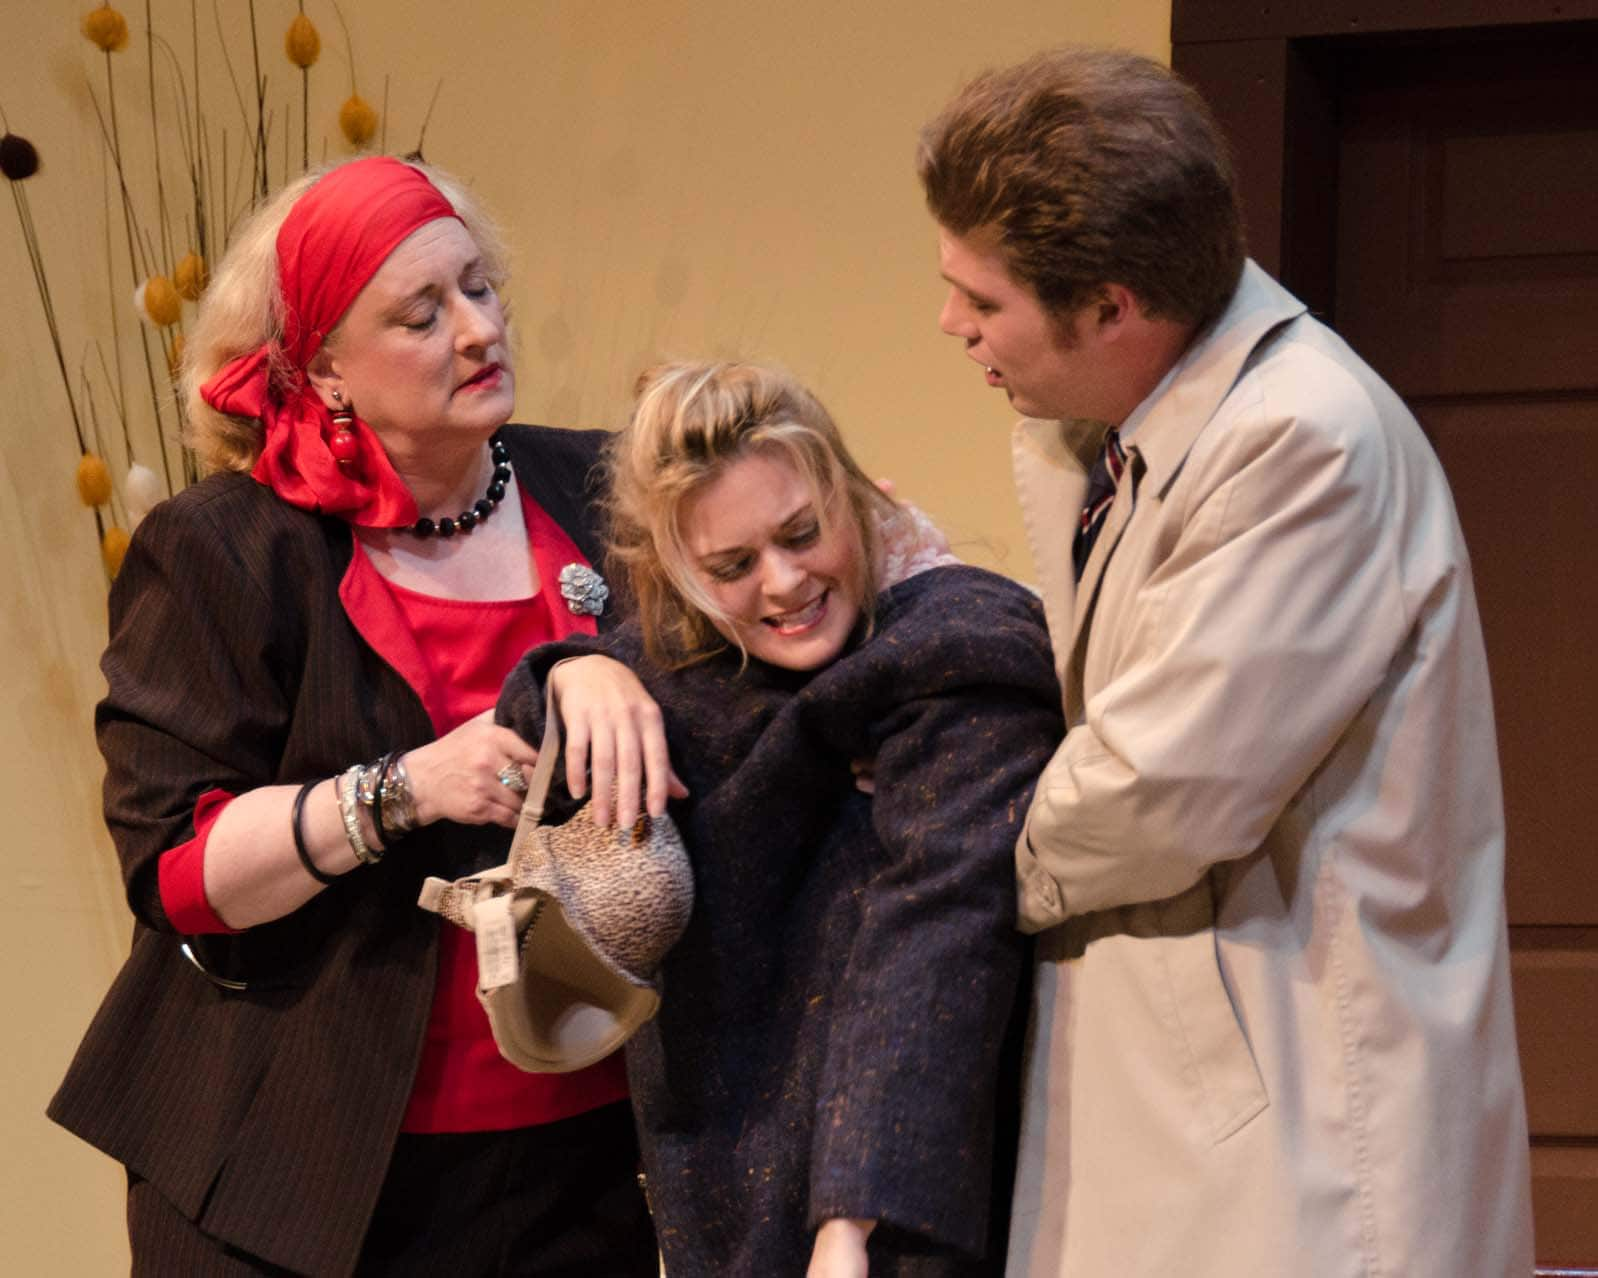 Gayle Nichols-Grimes (Betty Johnson), Charlene Sloan (Jean Perkins), and Erik Harrison (Henry Perkins). Photo by Doug Olmsted.